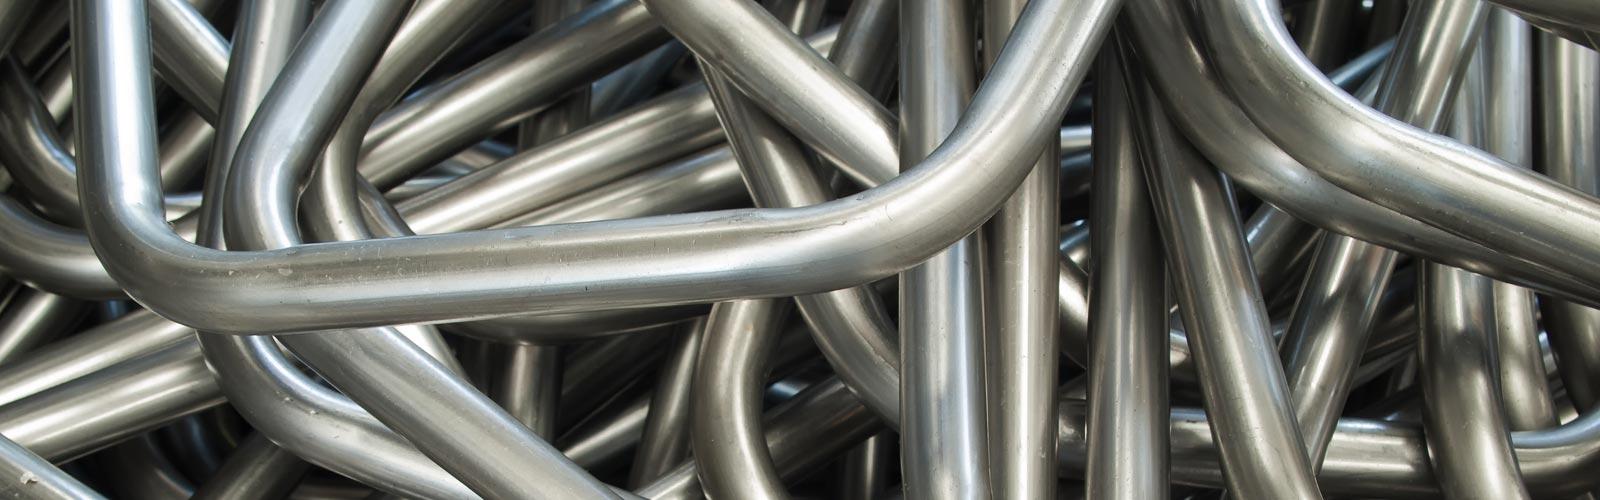 Tube Pipe bending machines